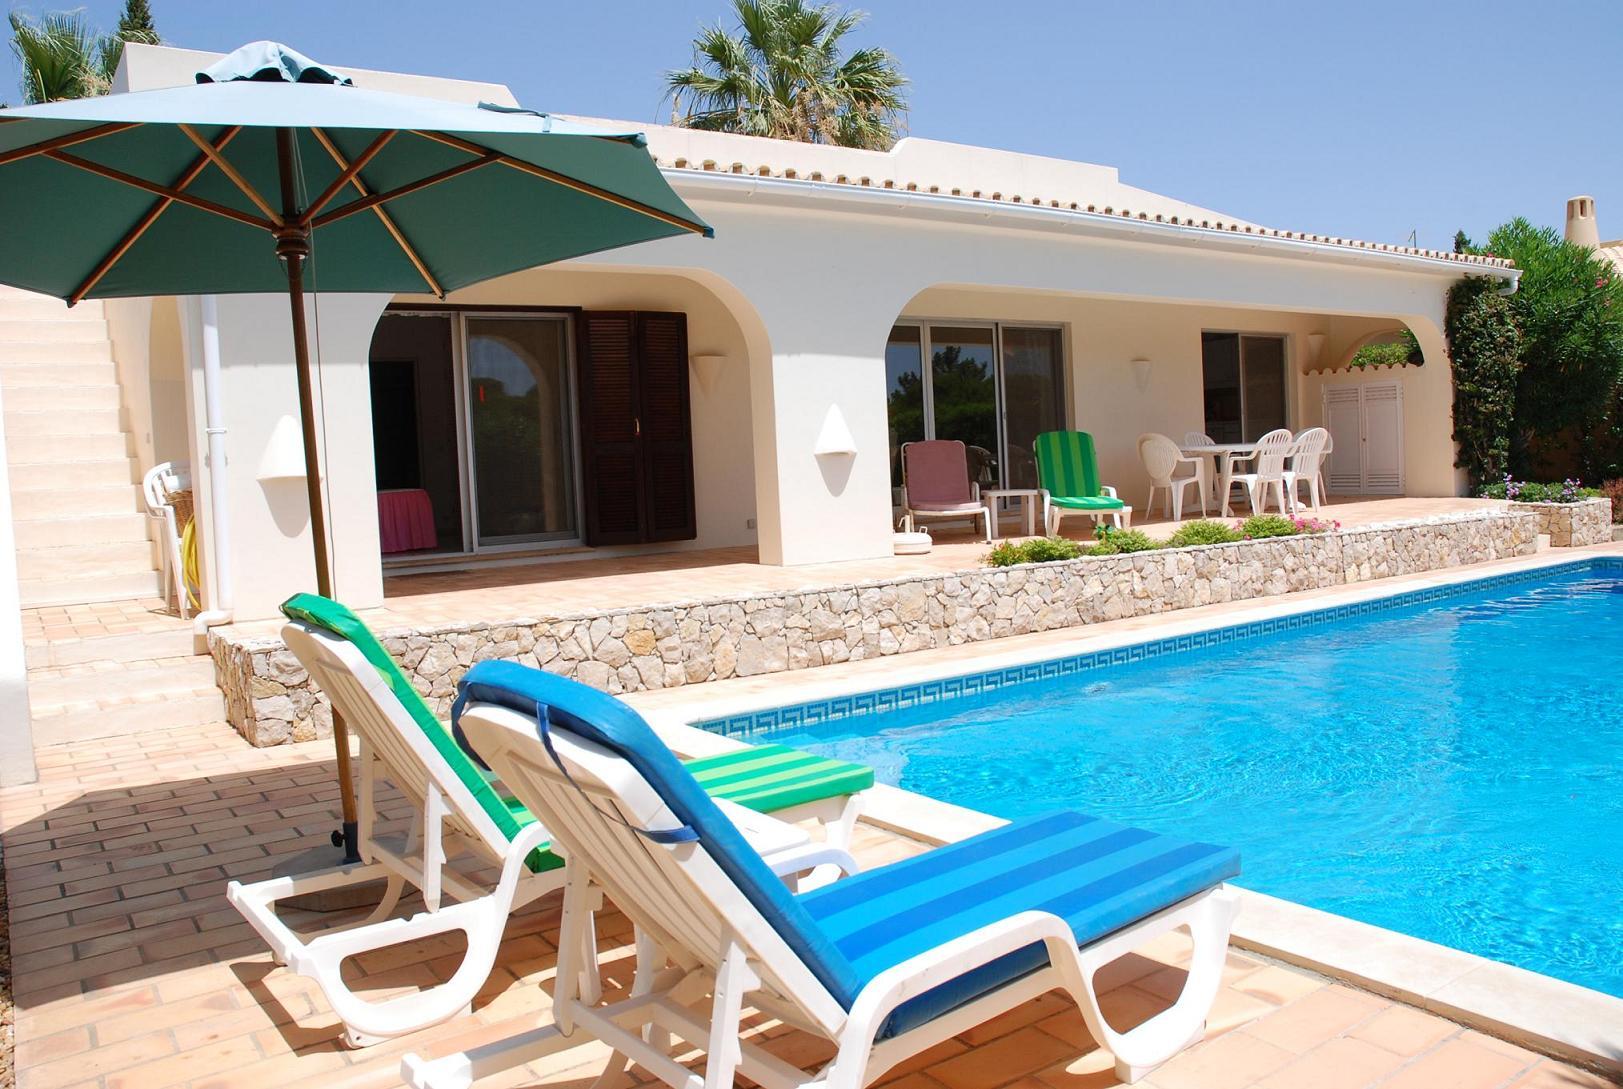 Algarve - Alojamento - Alojamento Self Catering - Casa Anna - ID 7058